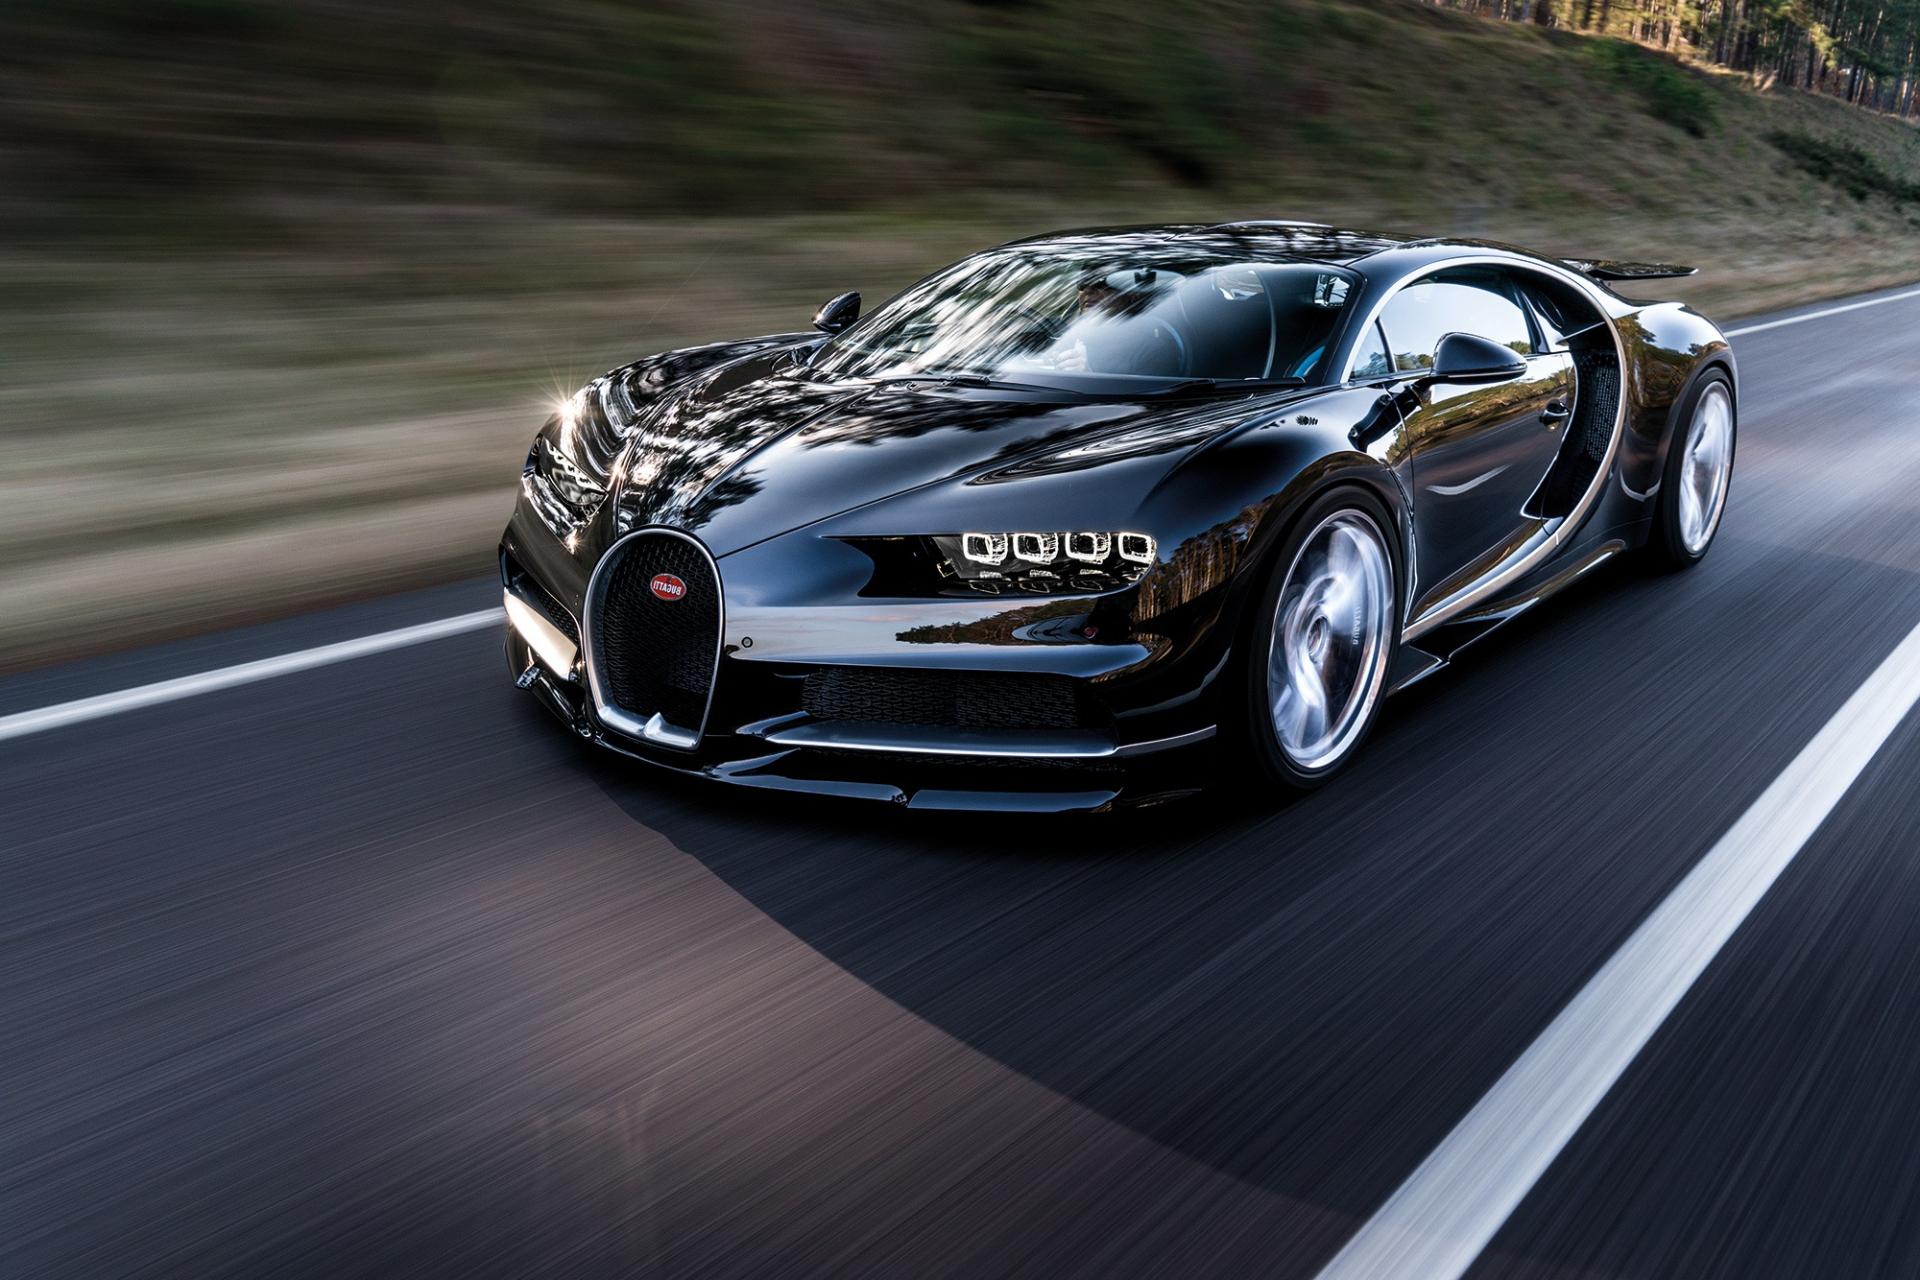 20 Bugatti Chiron Full Hd Wallpaper Latest Supercars Cool